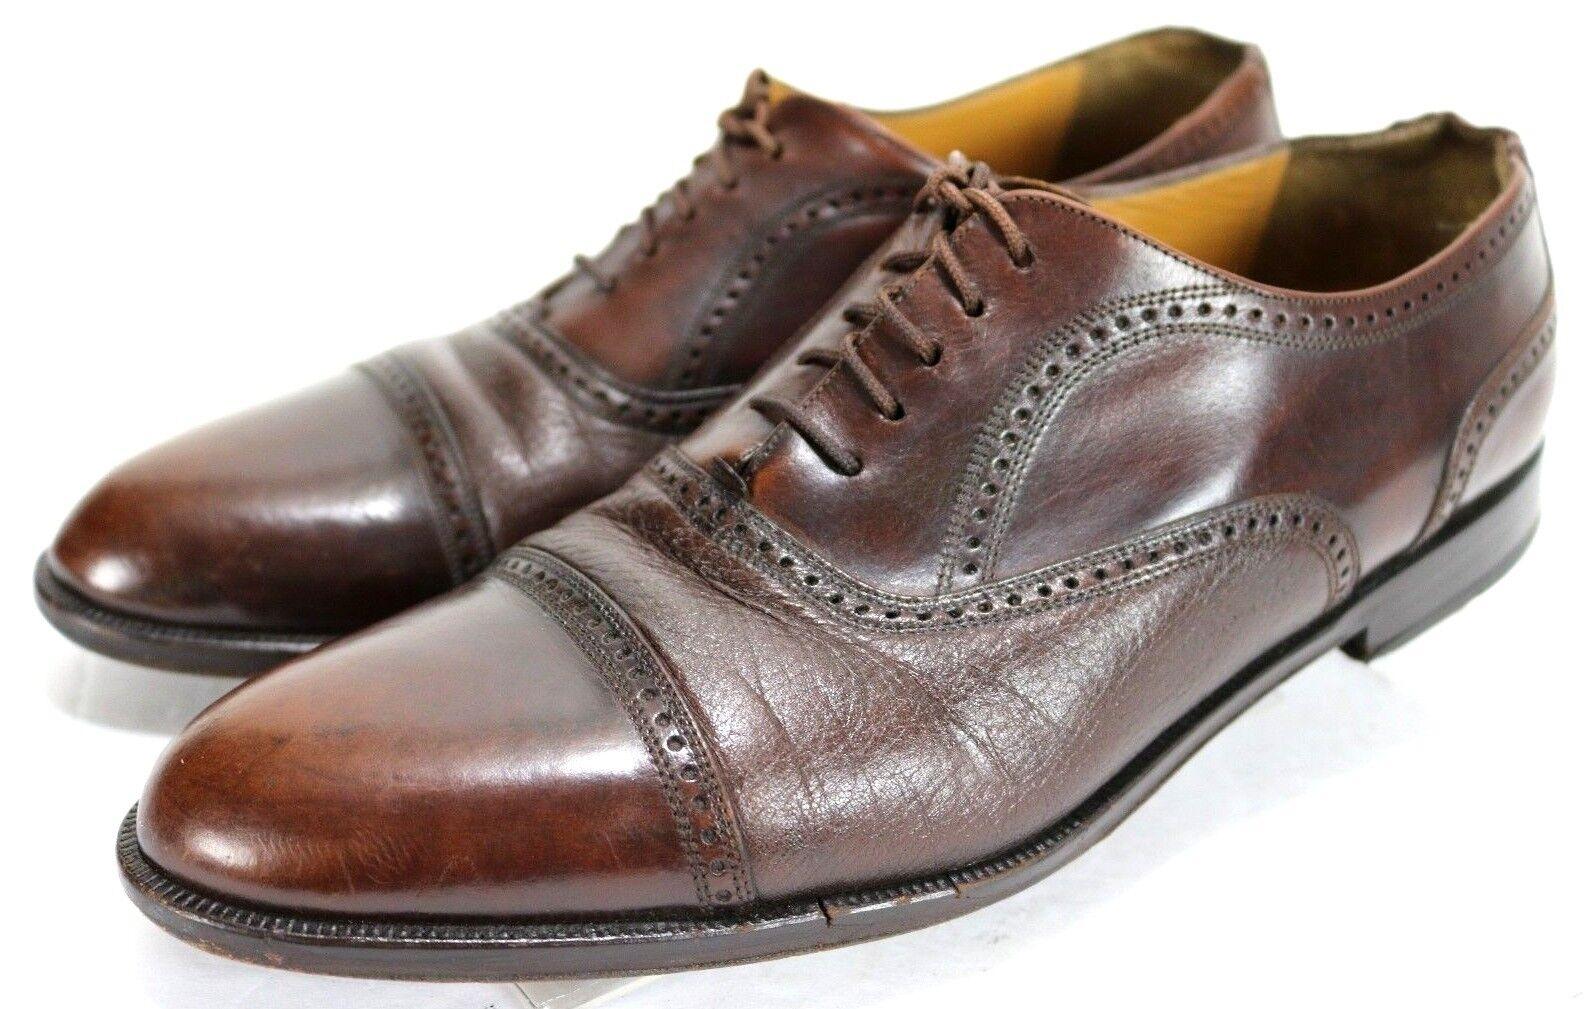 Mezlan Florence Men's  Cap-Toe Oxfords Dress shoes Size 10.5 Leather Brown